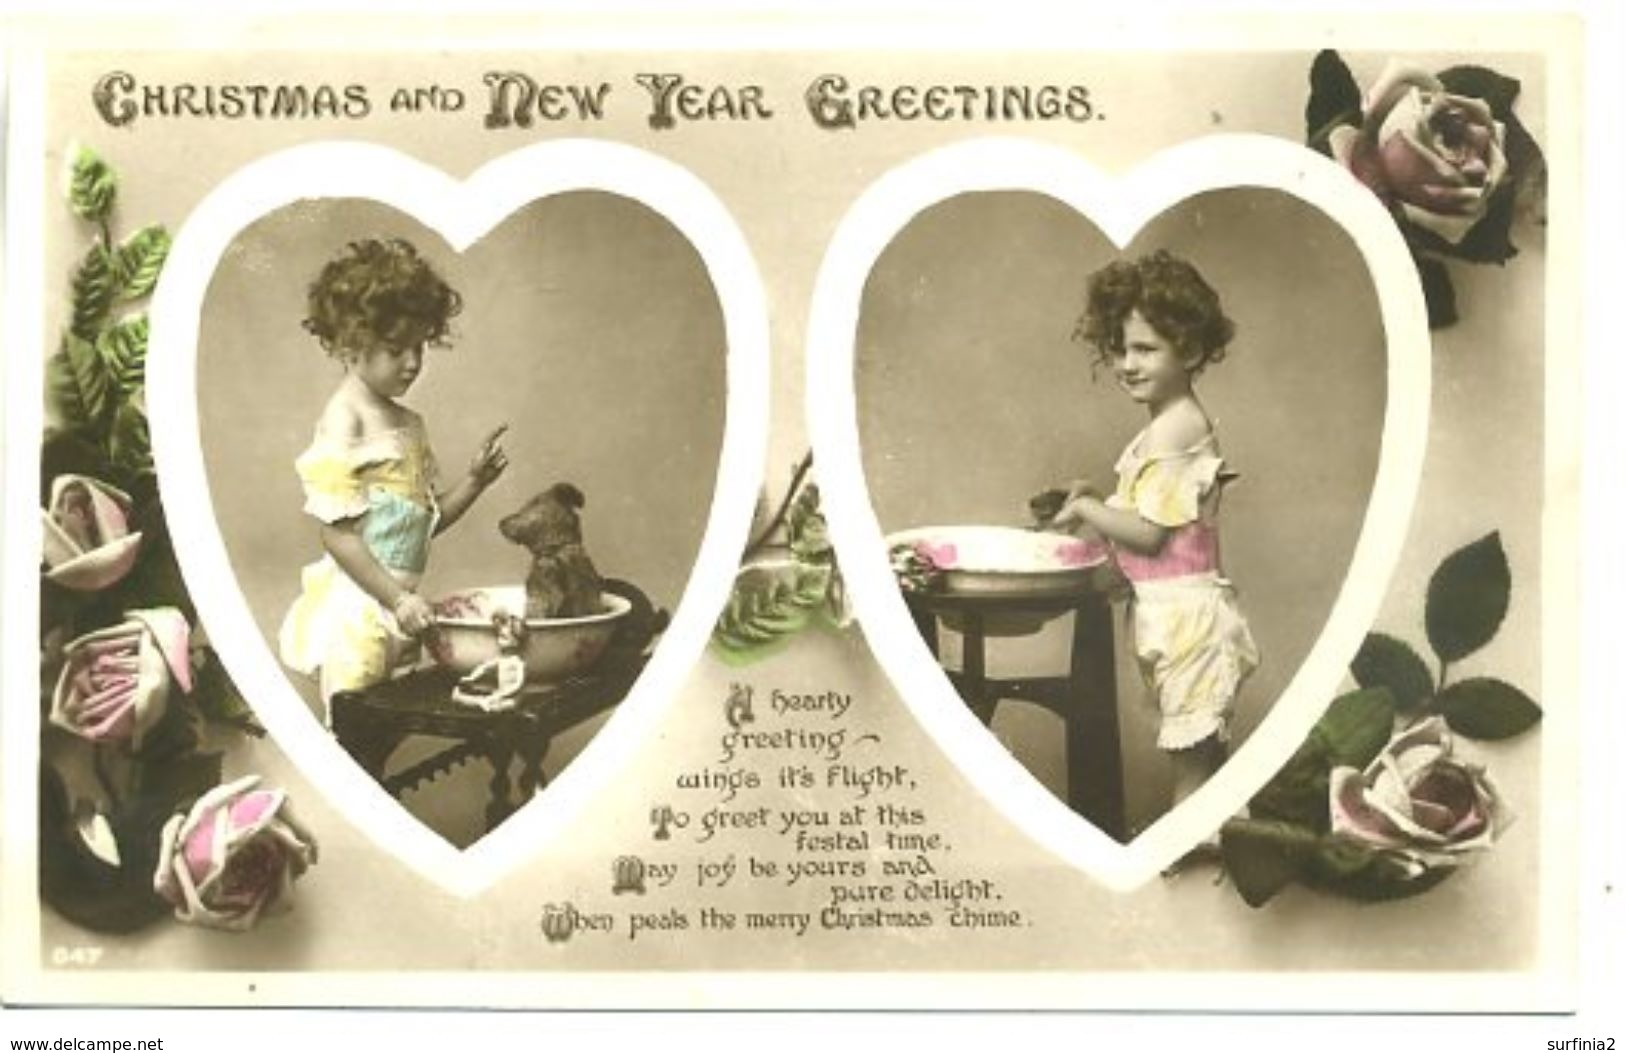 GREETINGS - CHRISTMAS AND NEW YEAR - SMALL GIRL WITH TEDDY - Christmas